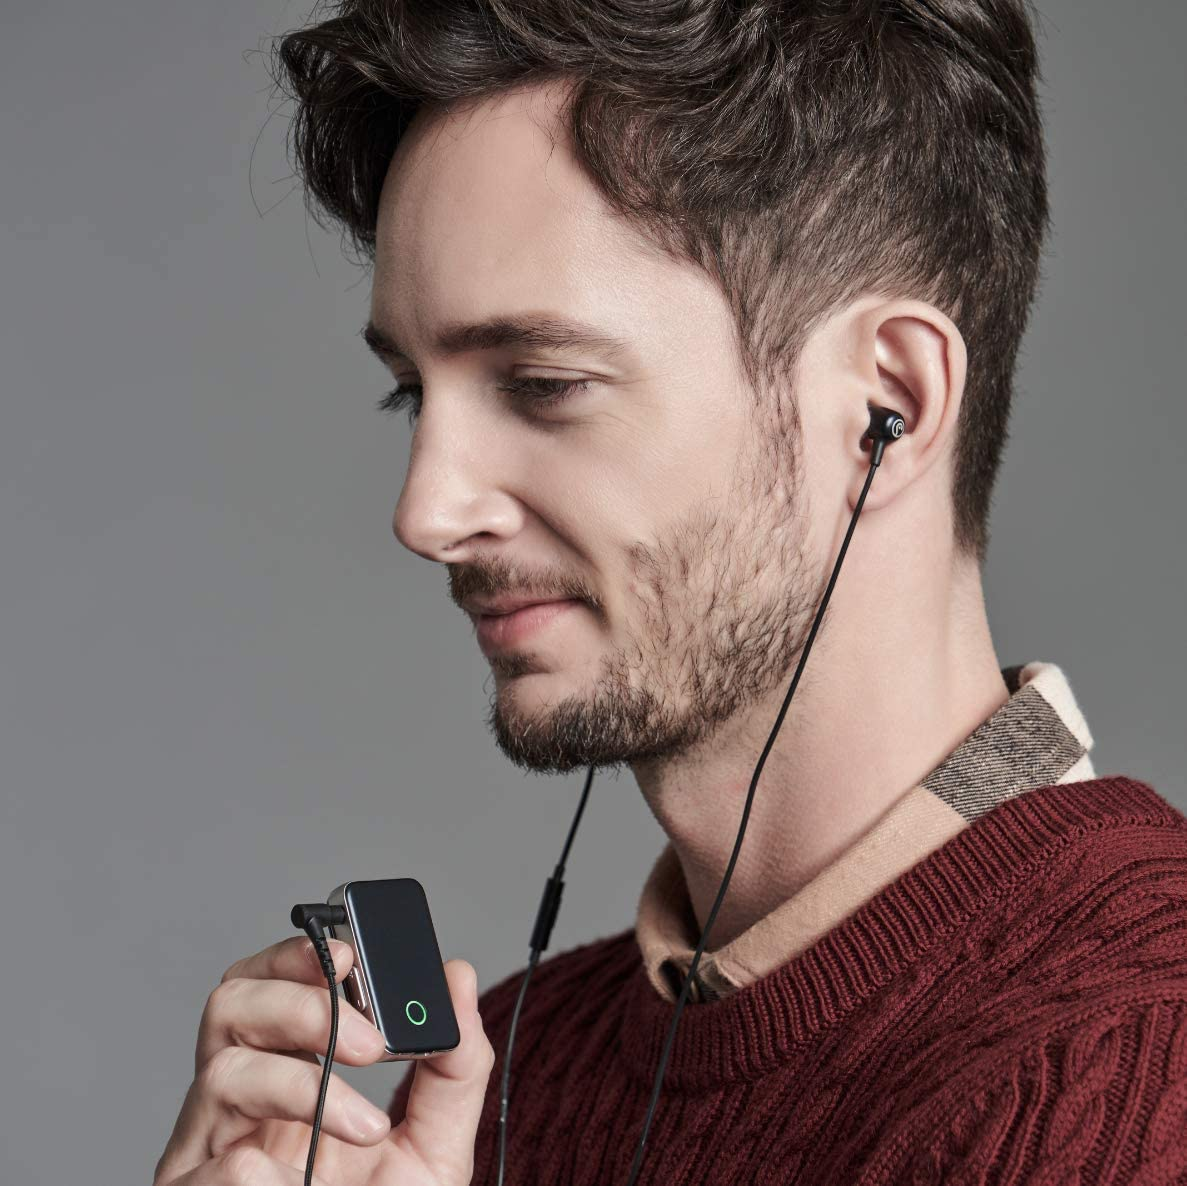 3.5mm Unbalanced /& 2.5mm Balanced Output aptX Renewed EarStudio ES100 MK2-24bit Portable High-Resolution Bluetooth Receiver//USB DAC//Headphone Amp with LDAC AAC aptX HD